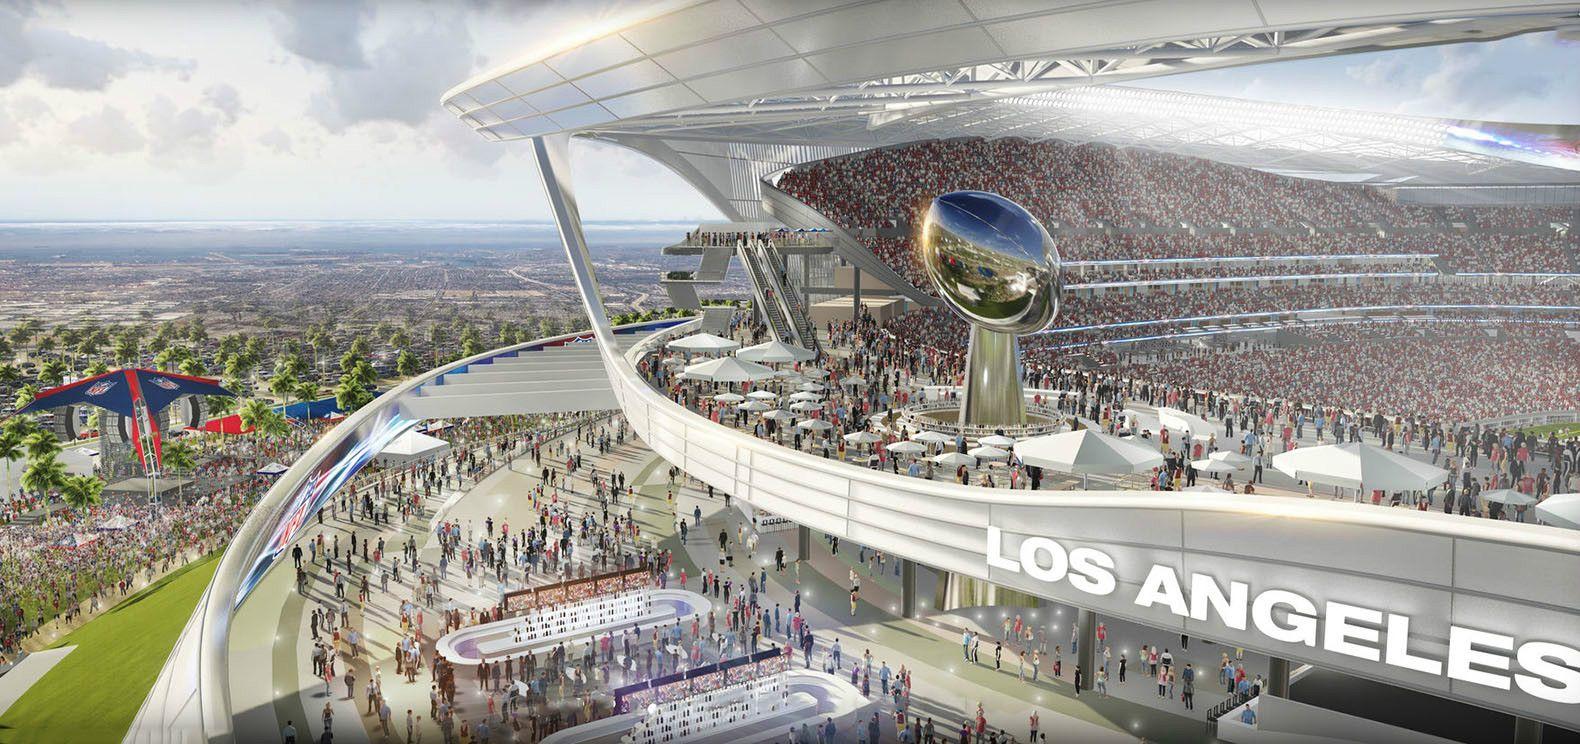 San Diego Chargers And Oakland Raiders Stadium Manica Architecture Arch2o Com Stadium Design San Diego Chargers Stadium